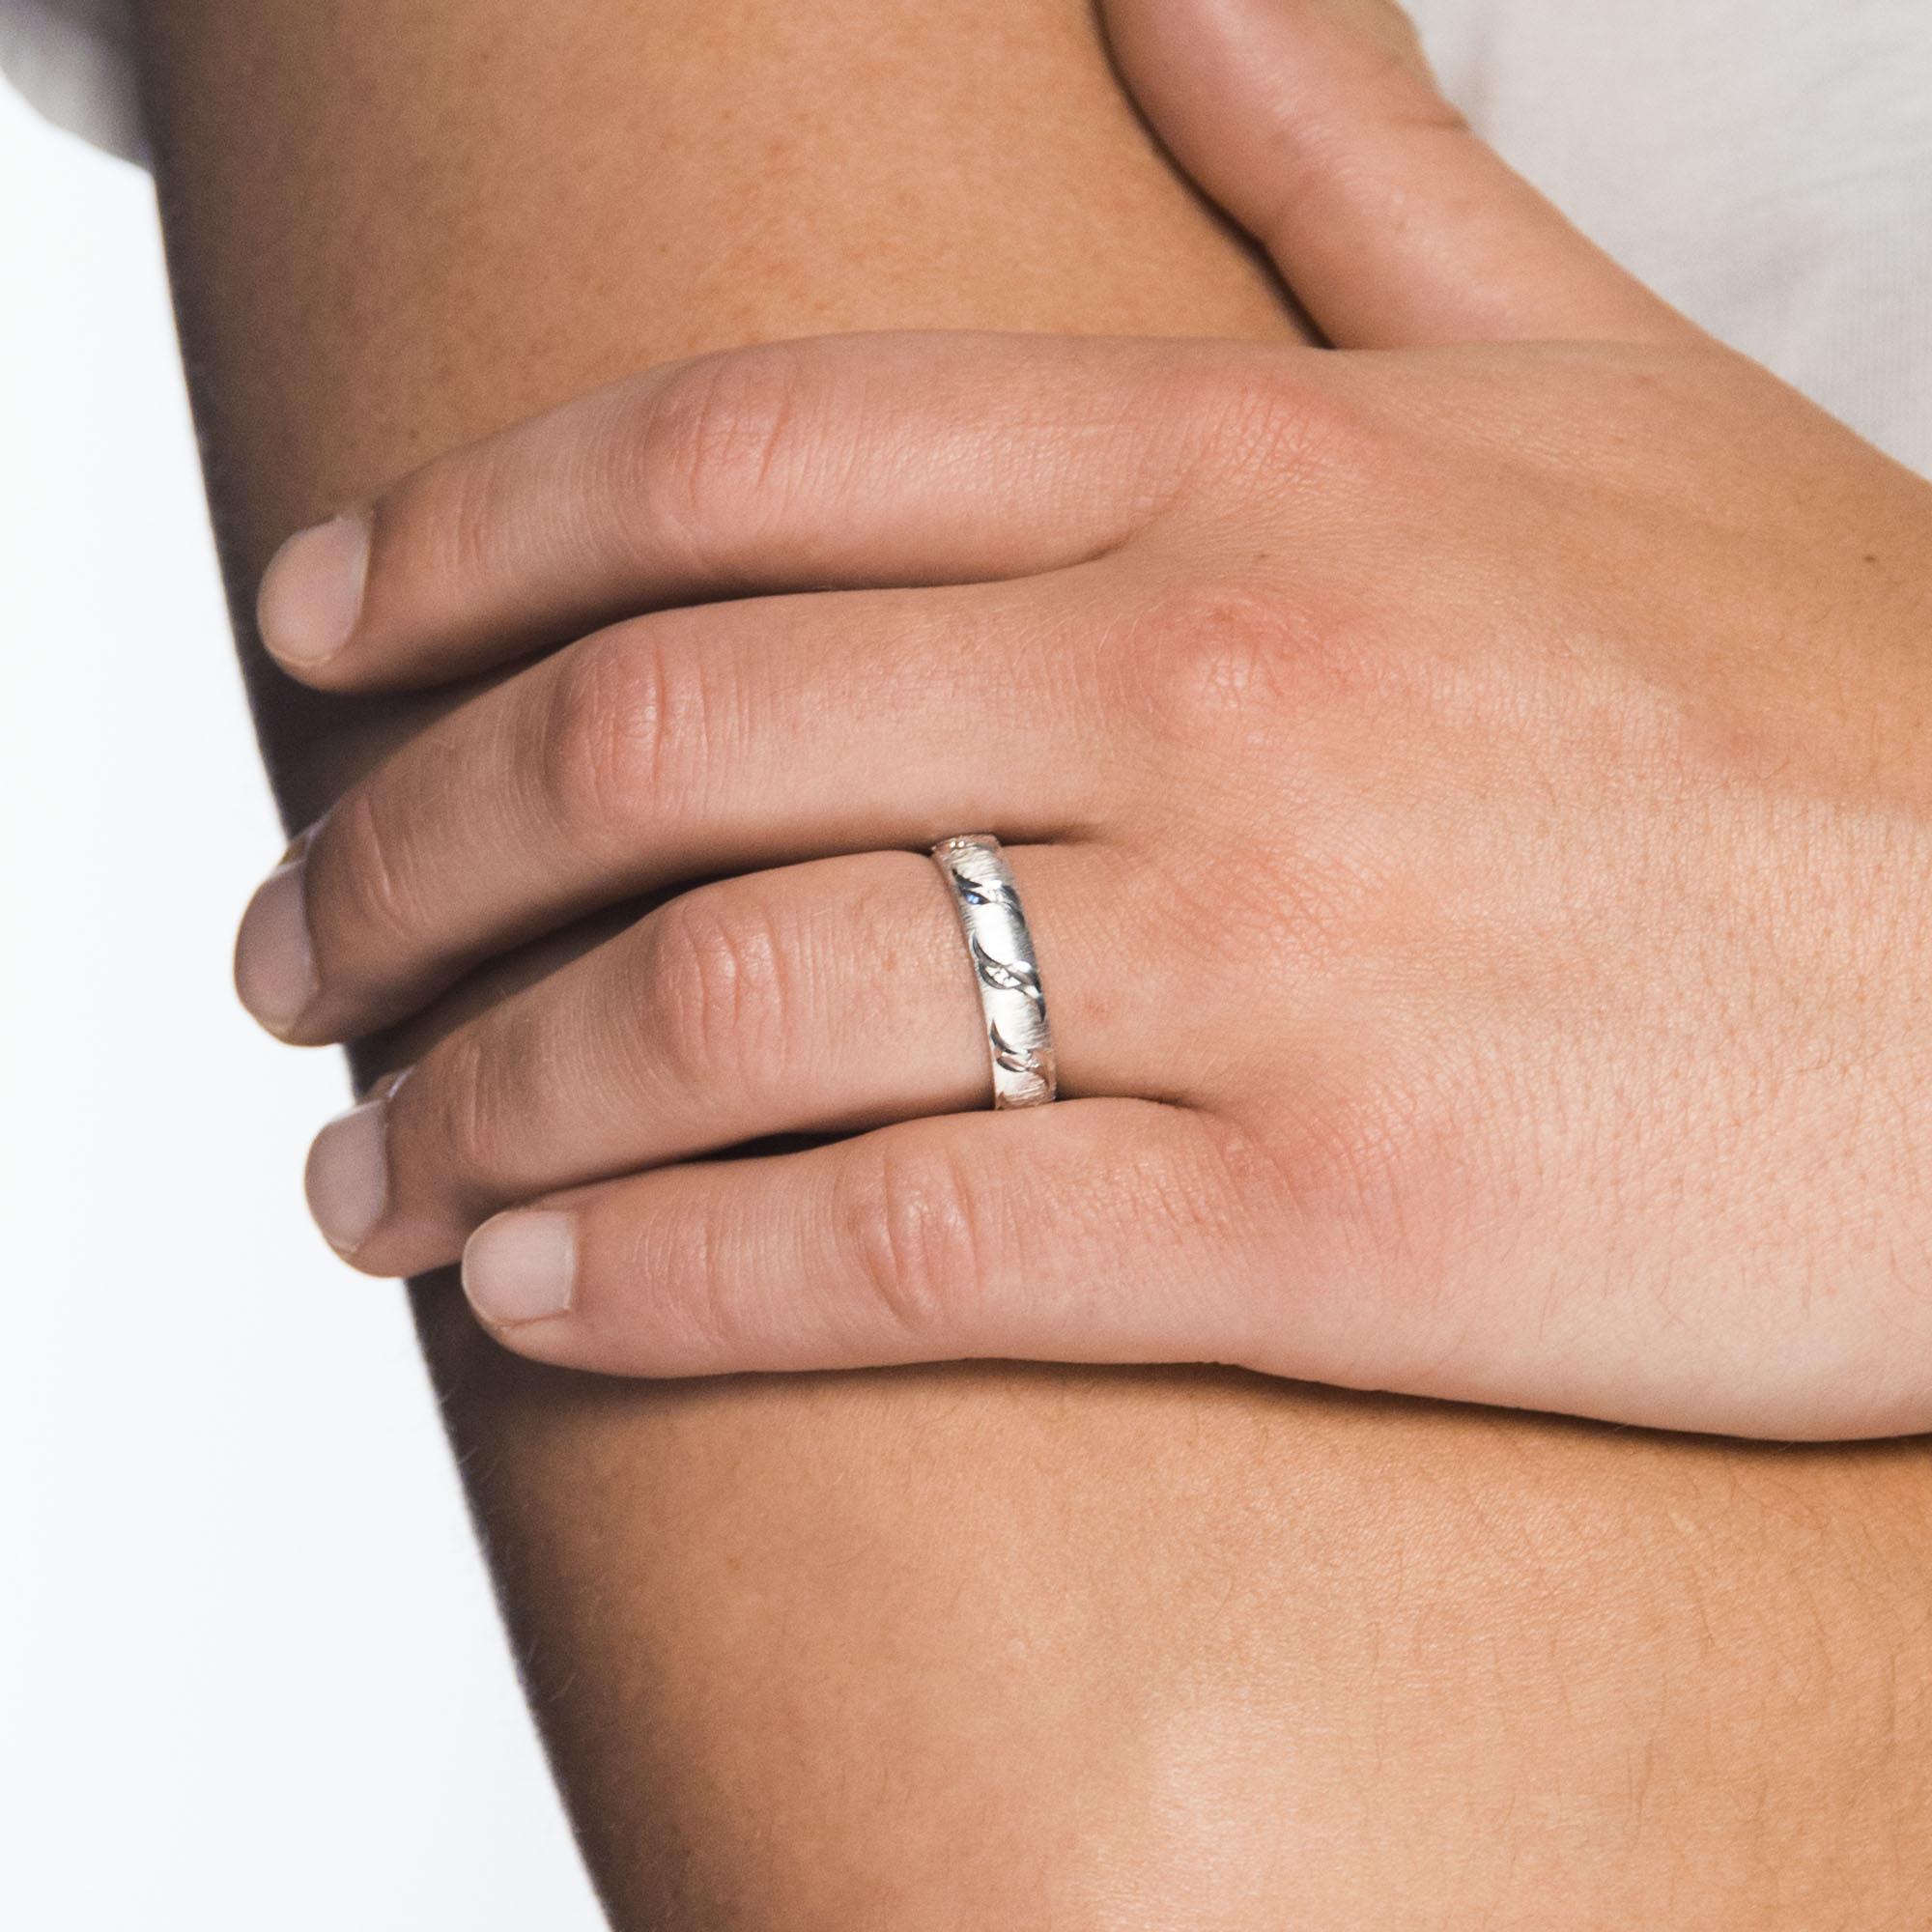 Juwelier Kraemer Freundschaftsringe Zirkonia 925 Silber 56 Mm